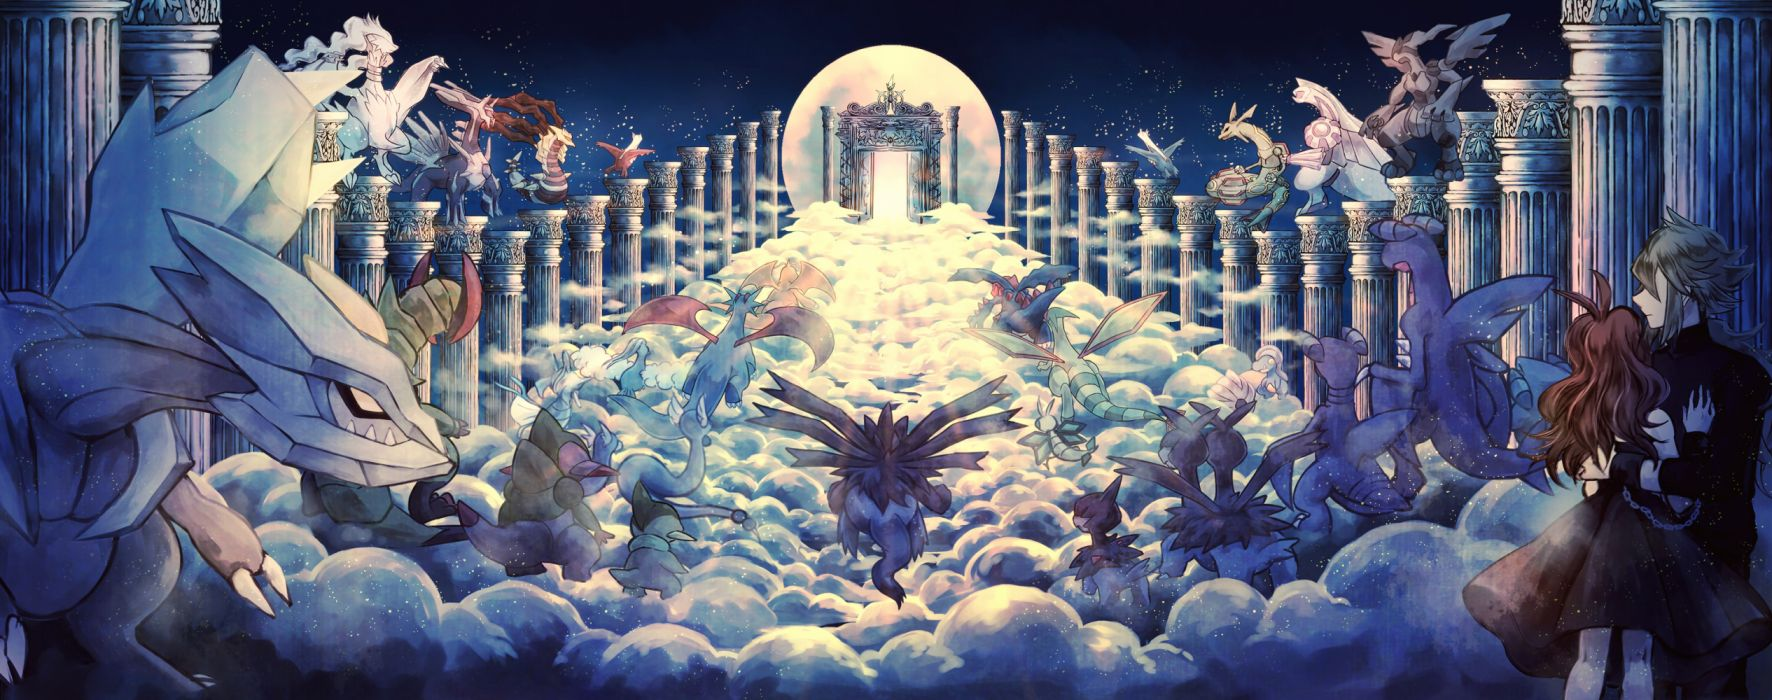 Konachan com - 257532 arceus axew bagon chain clouds dialga dratini flygon gible haxorus kingdra kyurem latias latios moon n palkia pokemon shelgon torute vibrava zekrom wallpaper